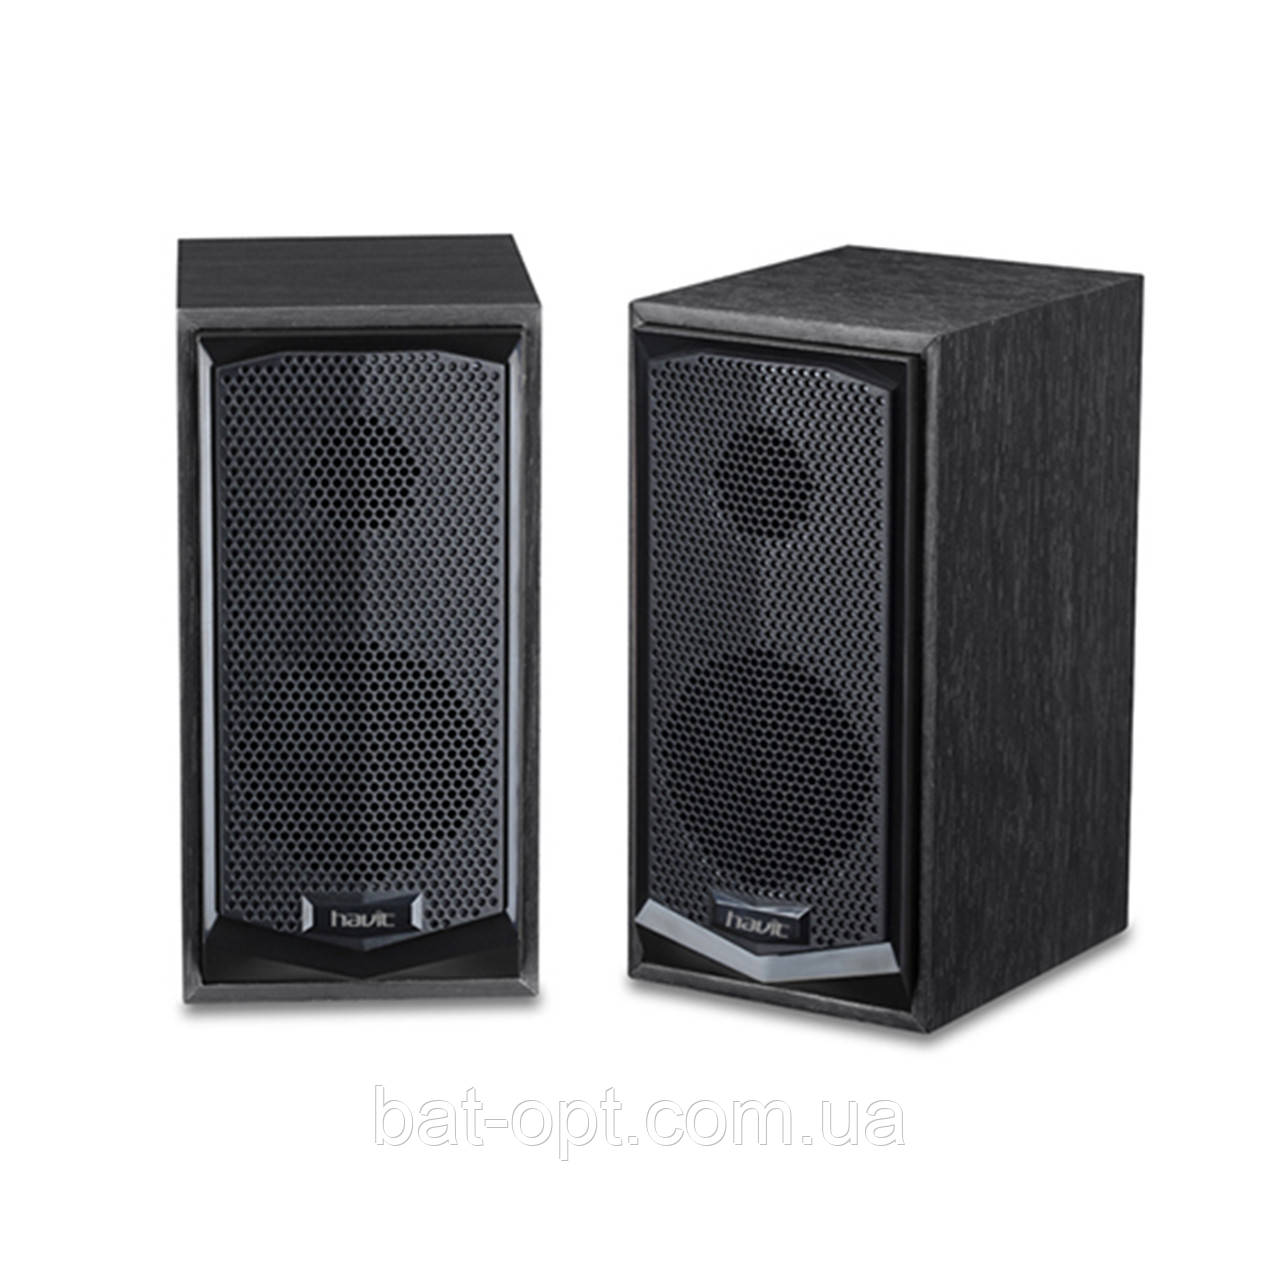 Колонки акустические Havit HV-SK518 USB black 15см